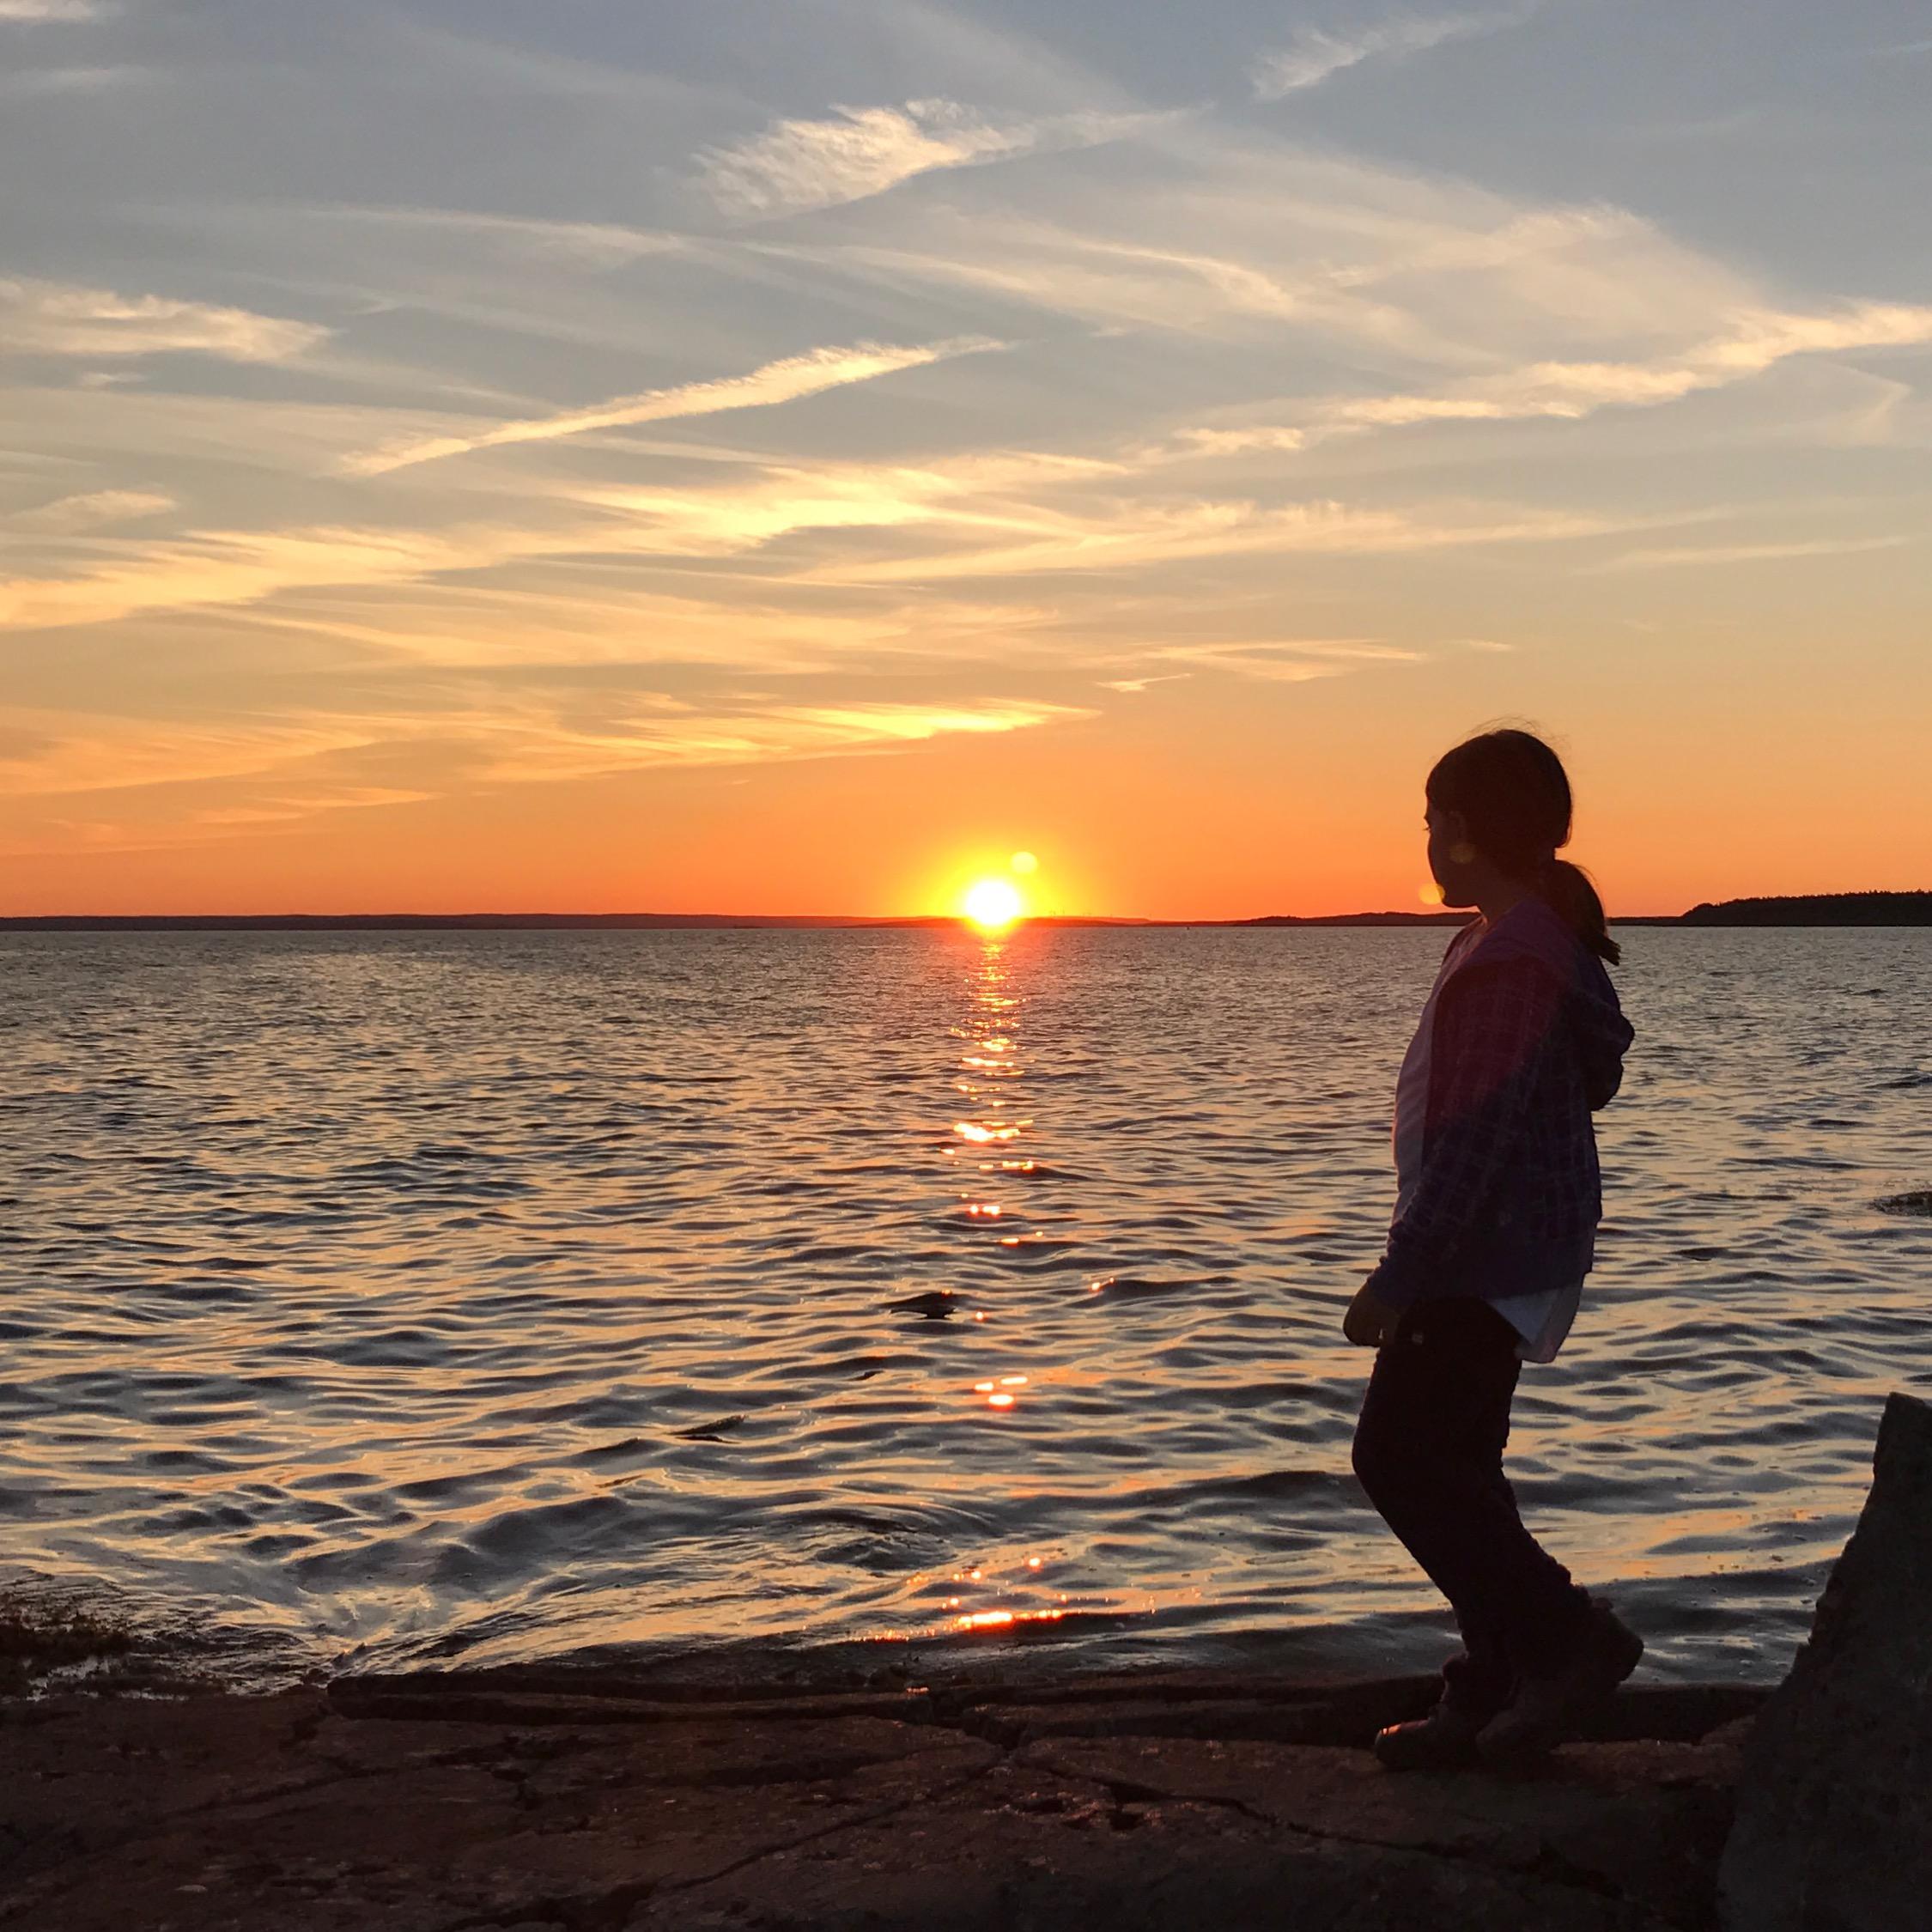 Sundown in Cape-Auget...wow! What beauty.